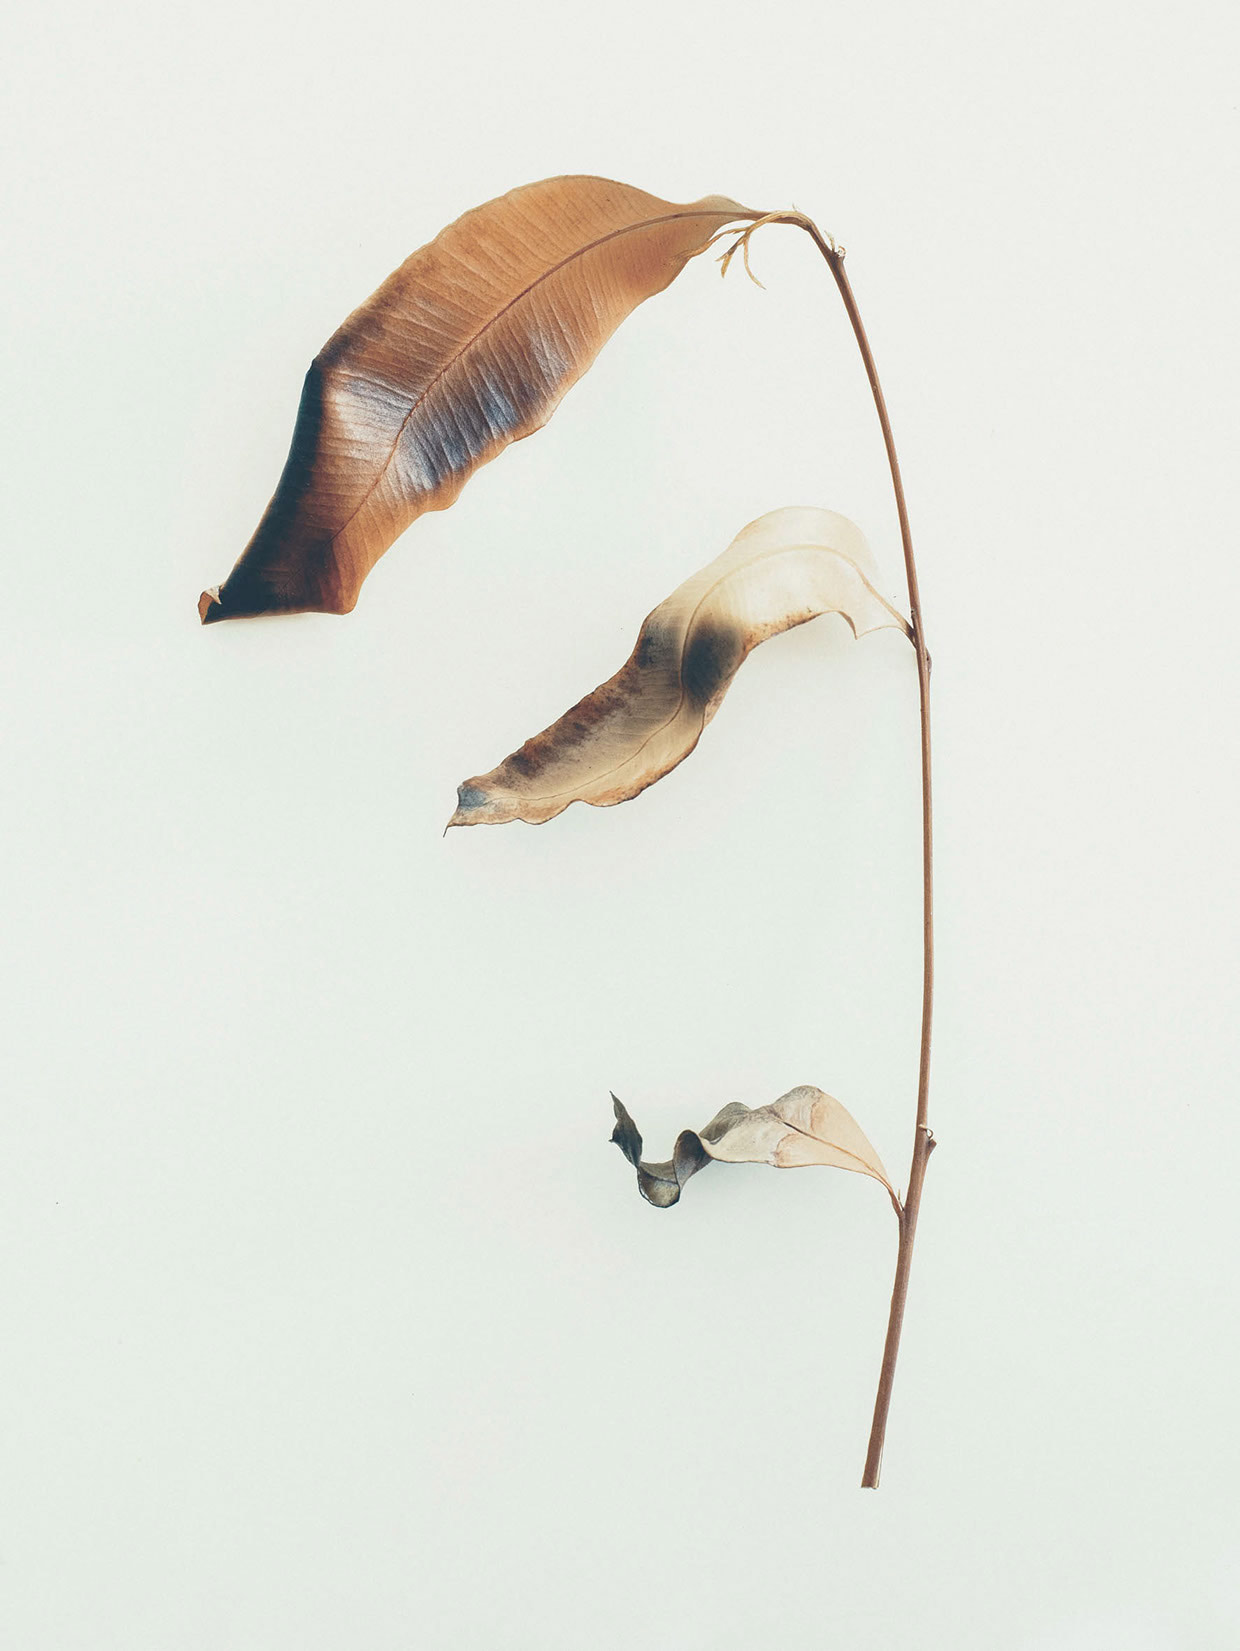 jared-fowler05